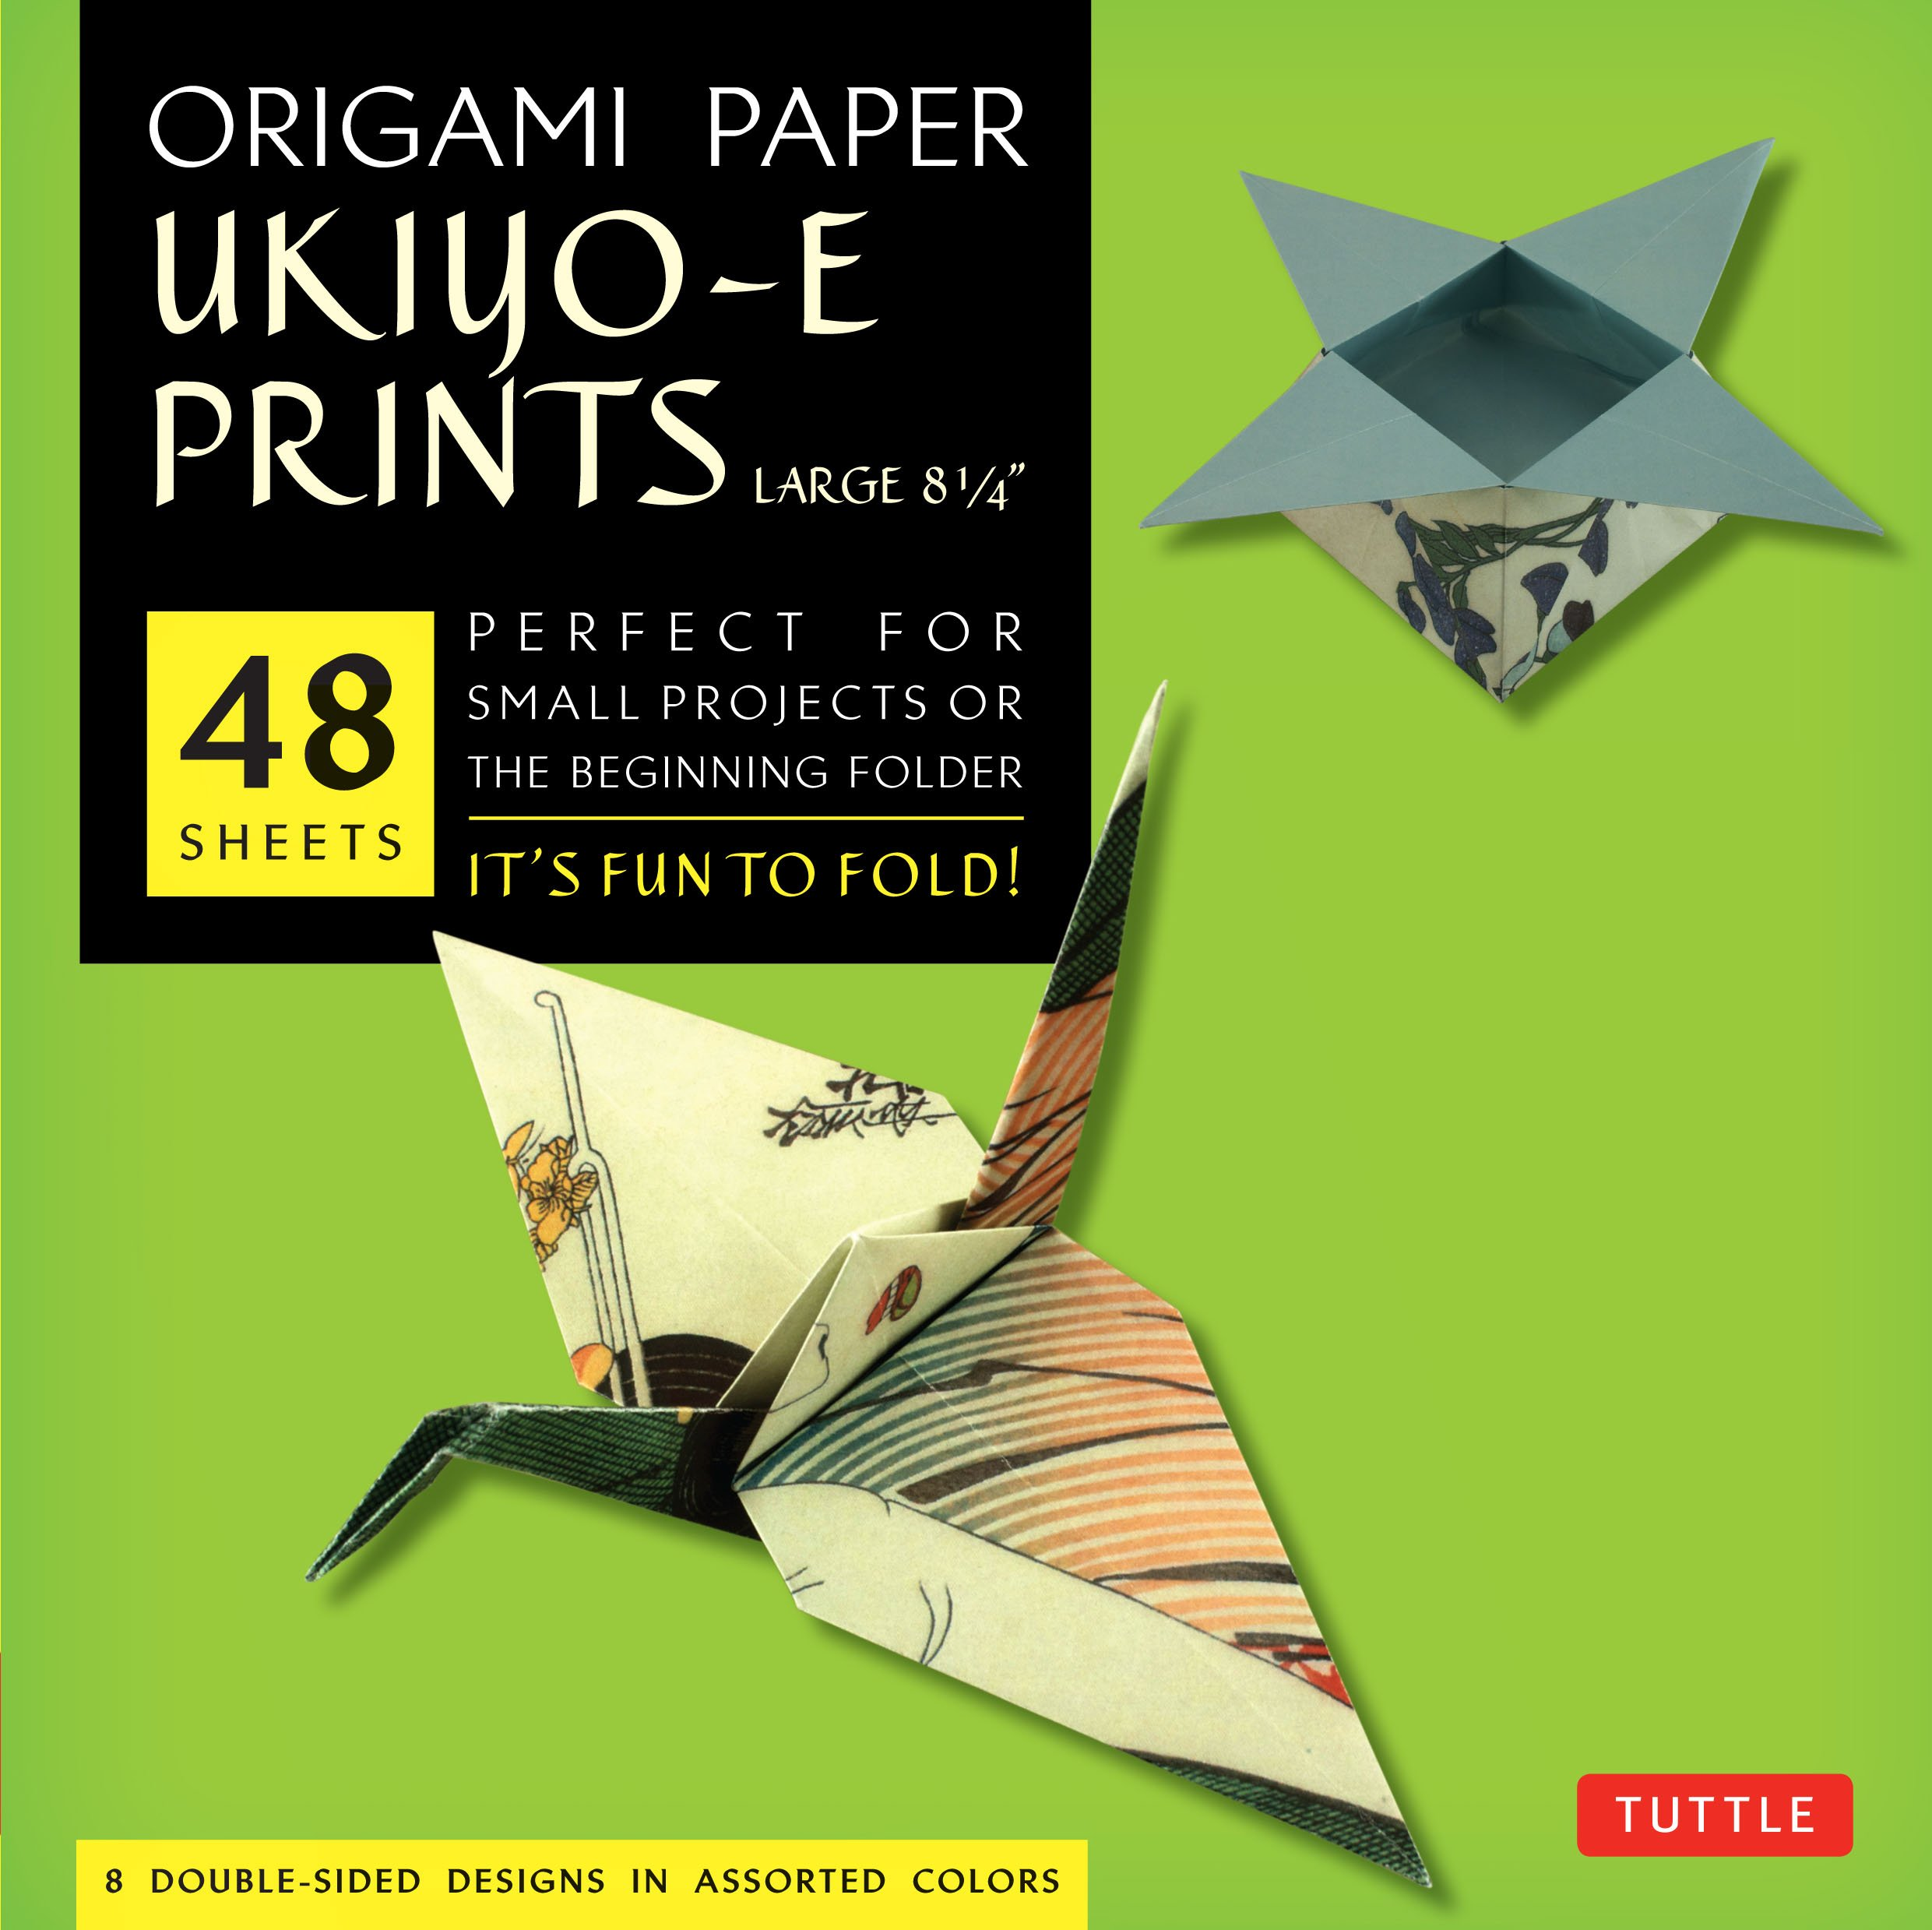 Tuttle Publishing: Origami Paper: Amazon.es: Editors, Tuttle: Libros en idiomas extranjeros